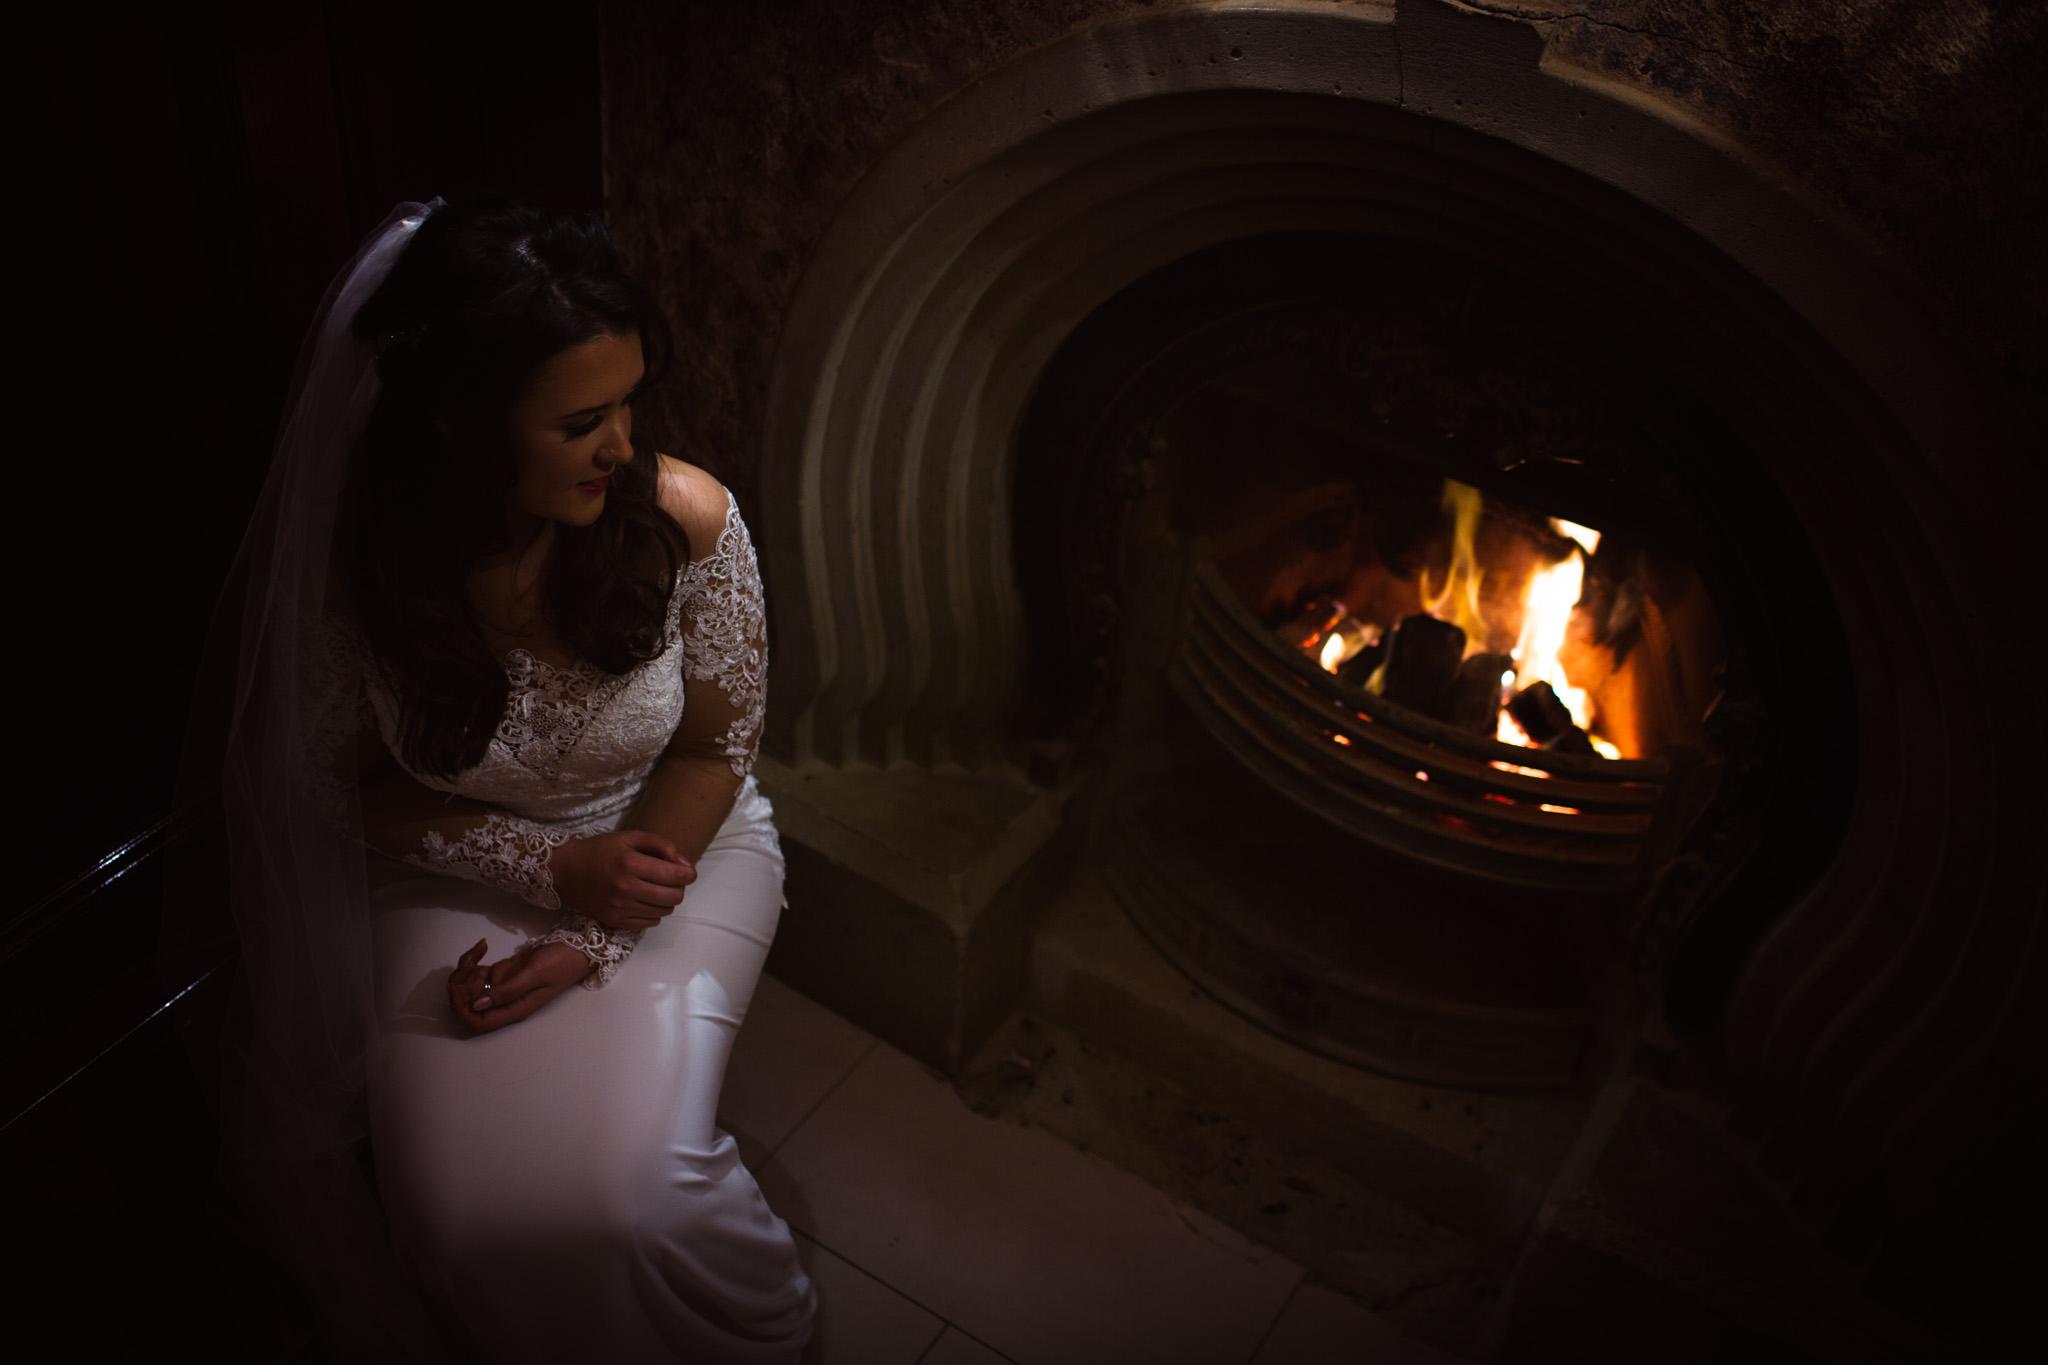 Mark_Barnes_Northern_Ireland_wedding_photographer_Harveys_Point_Donegall_Wedding_photography-Adam&Gemma-44.jpg